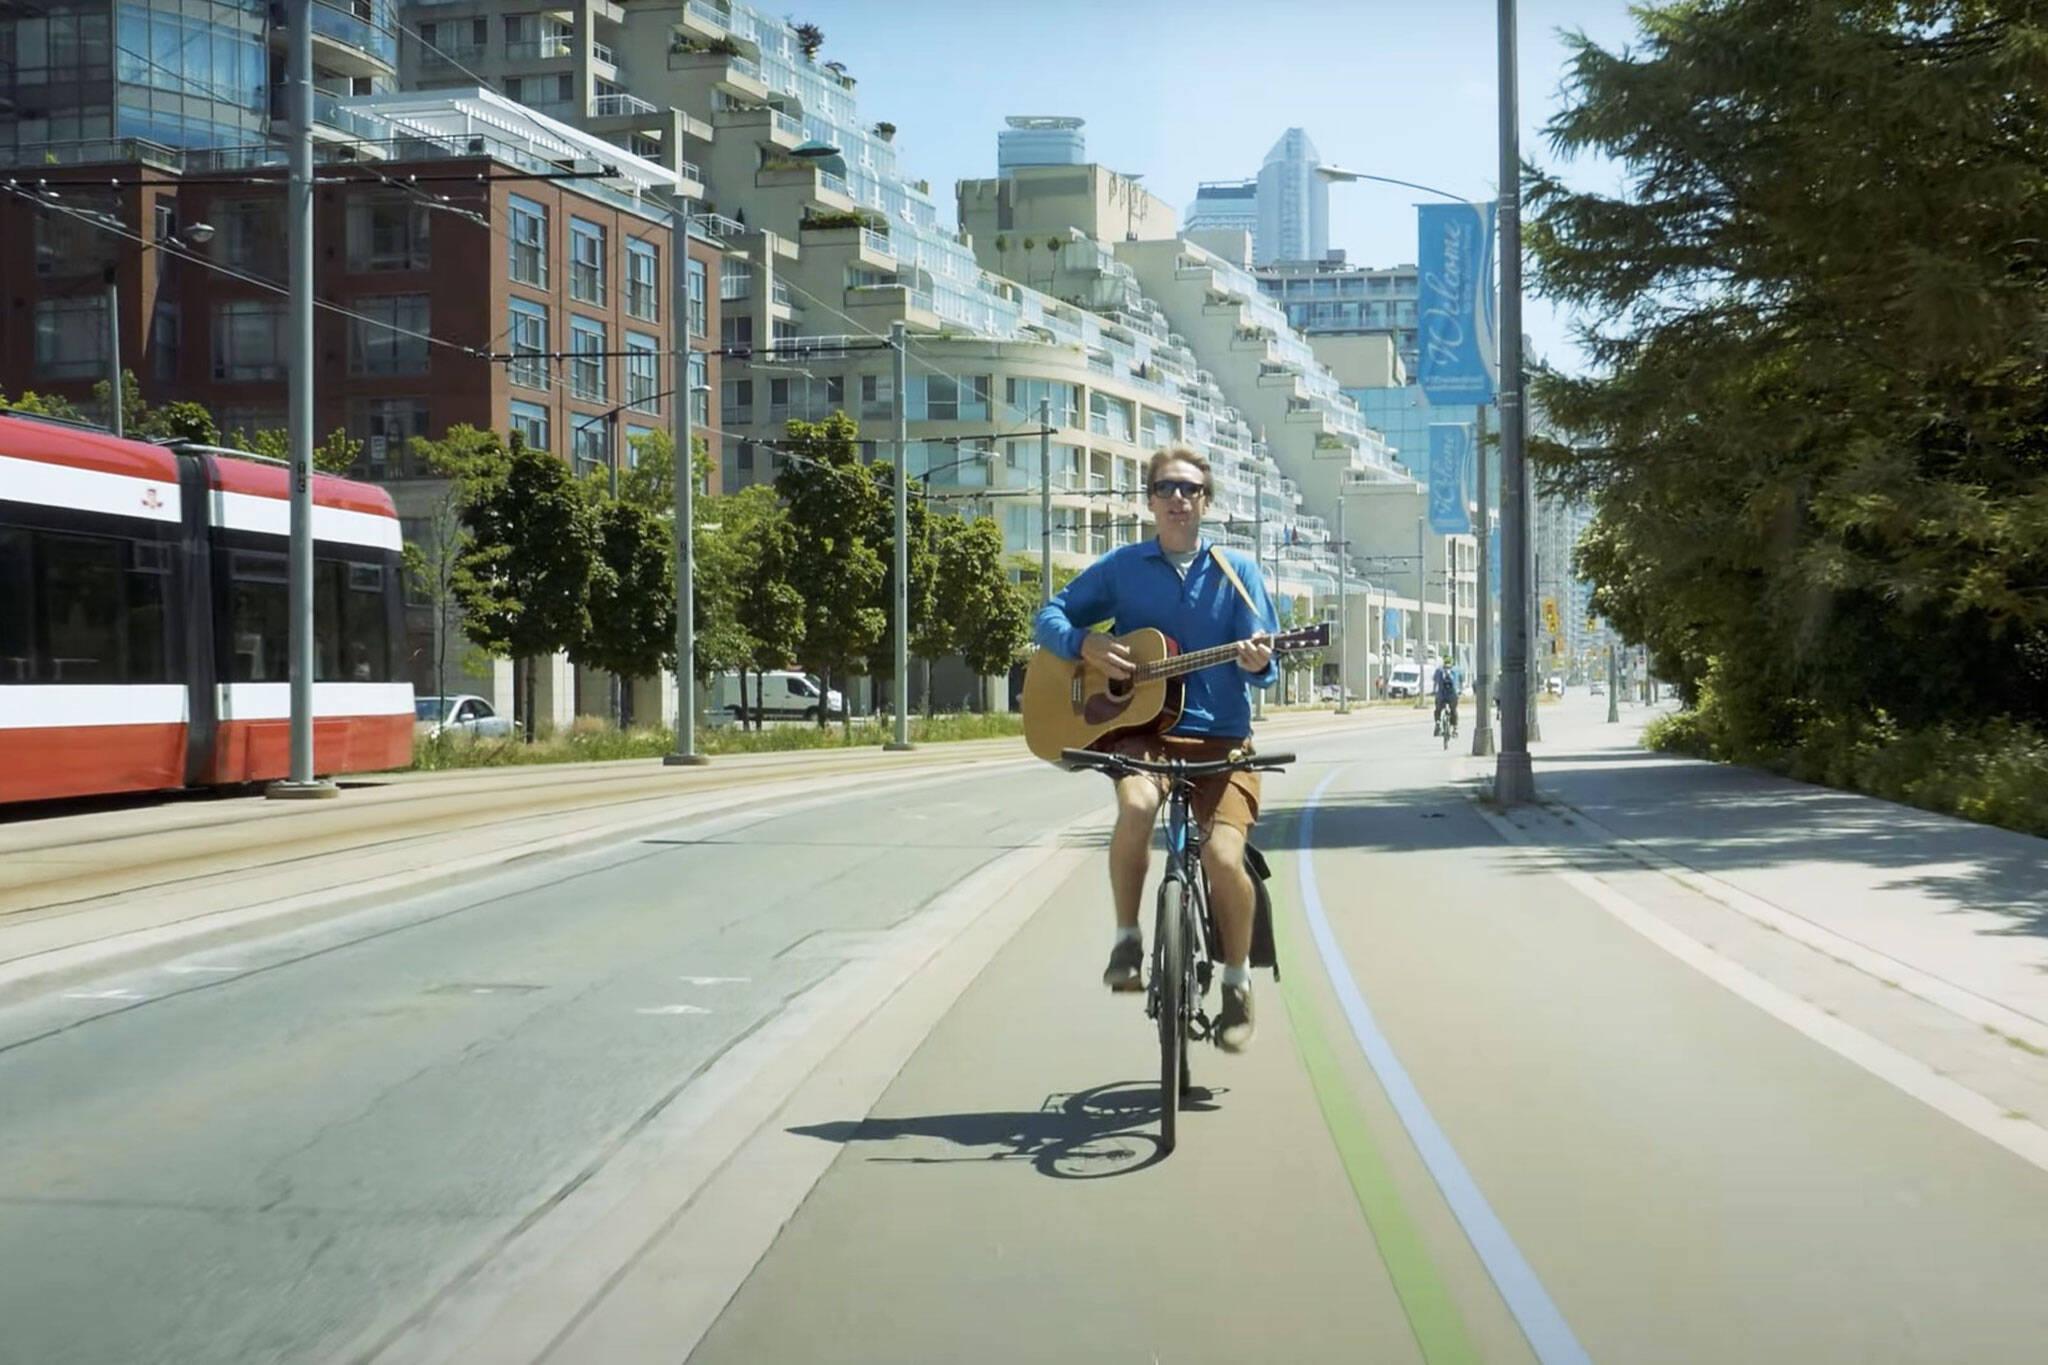 toronto bike song